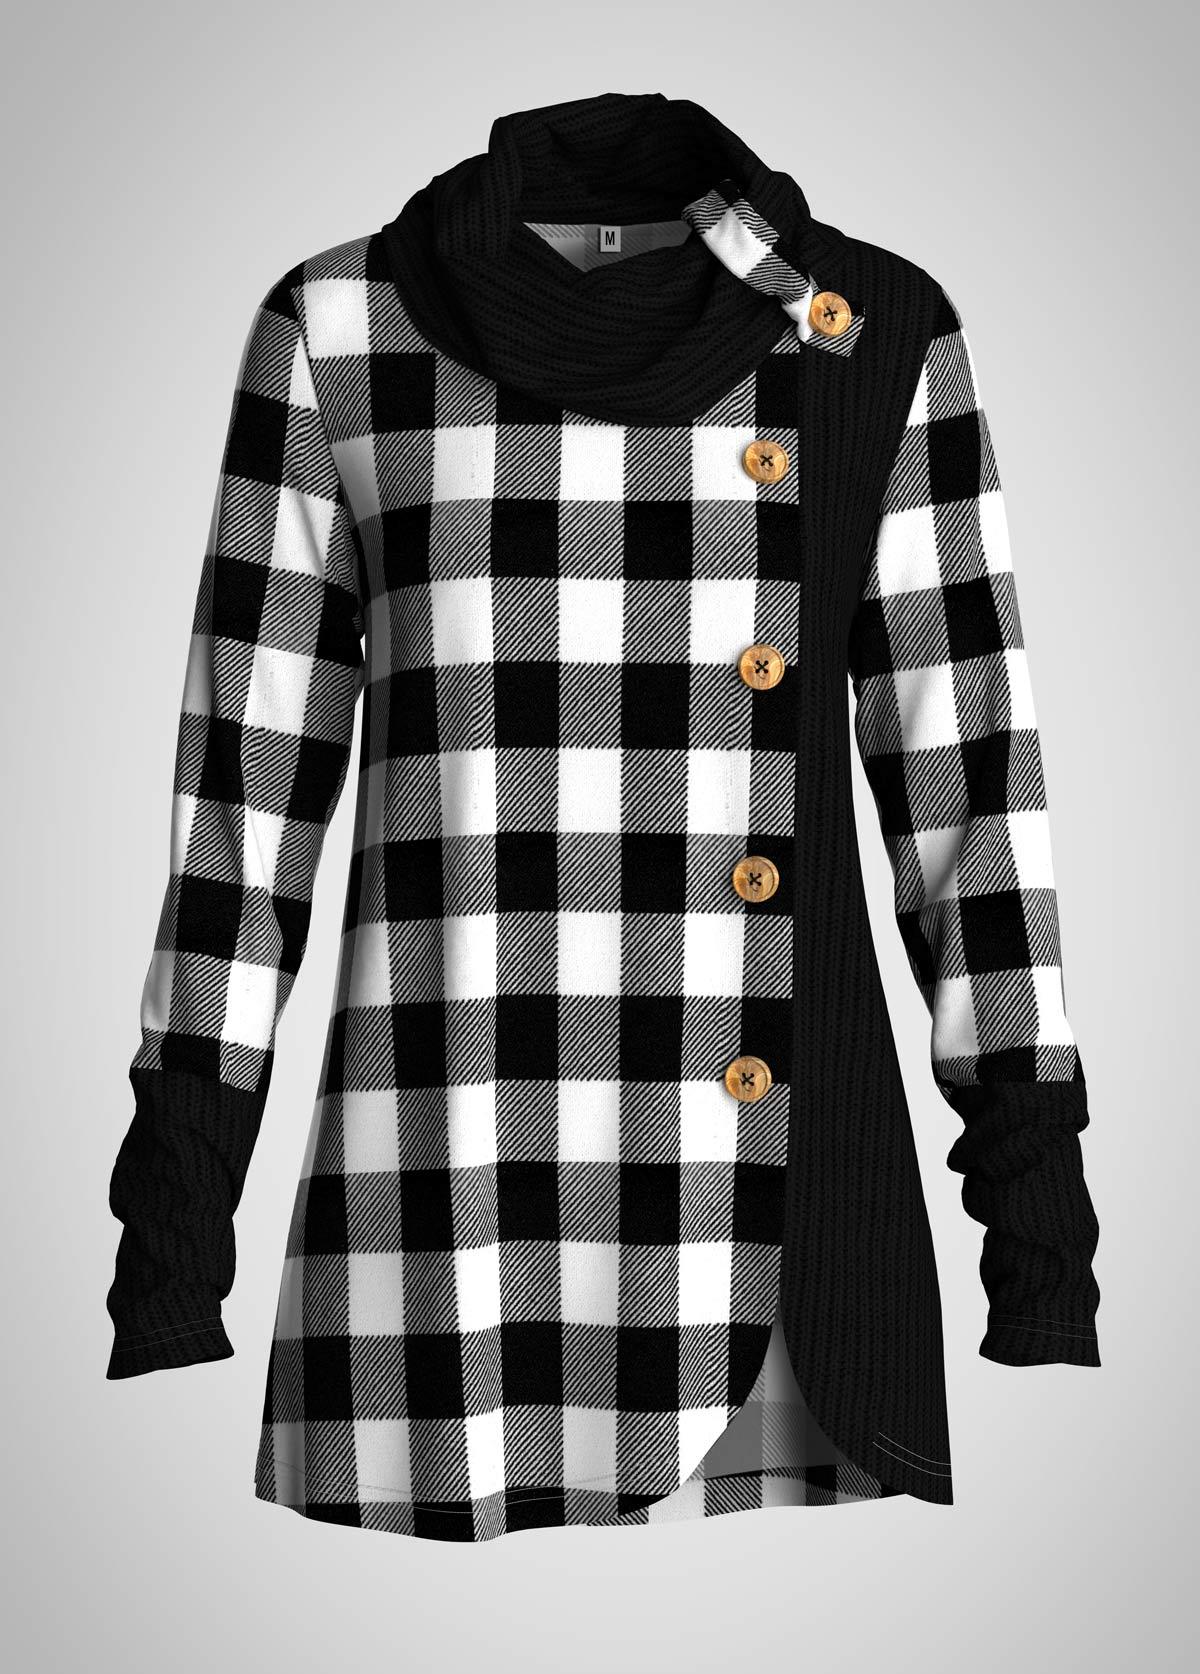 ROTITA Plaid Asymmetric Hem Cowl Neck Button Tunic Top